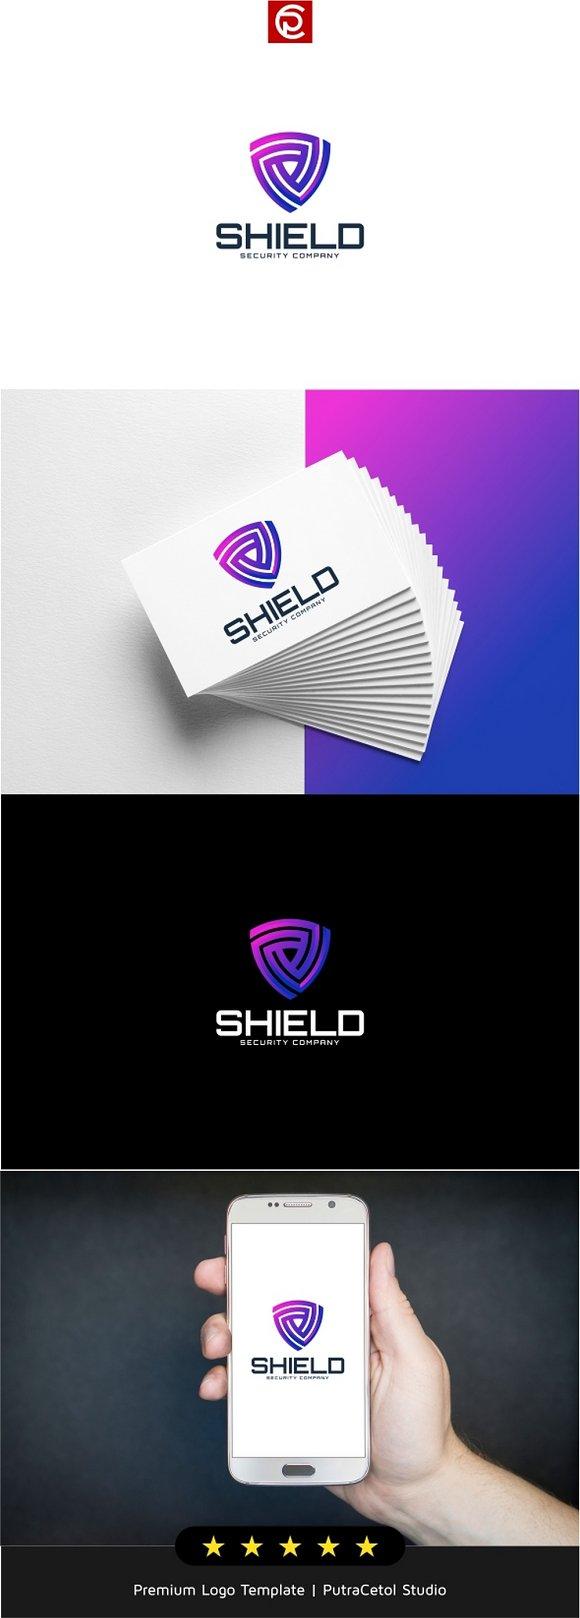 Digital Shield Logo